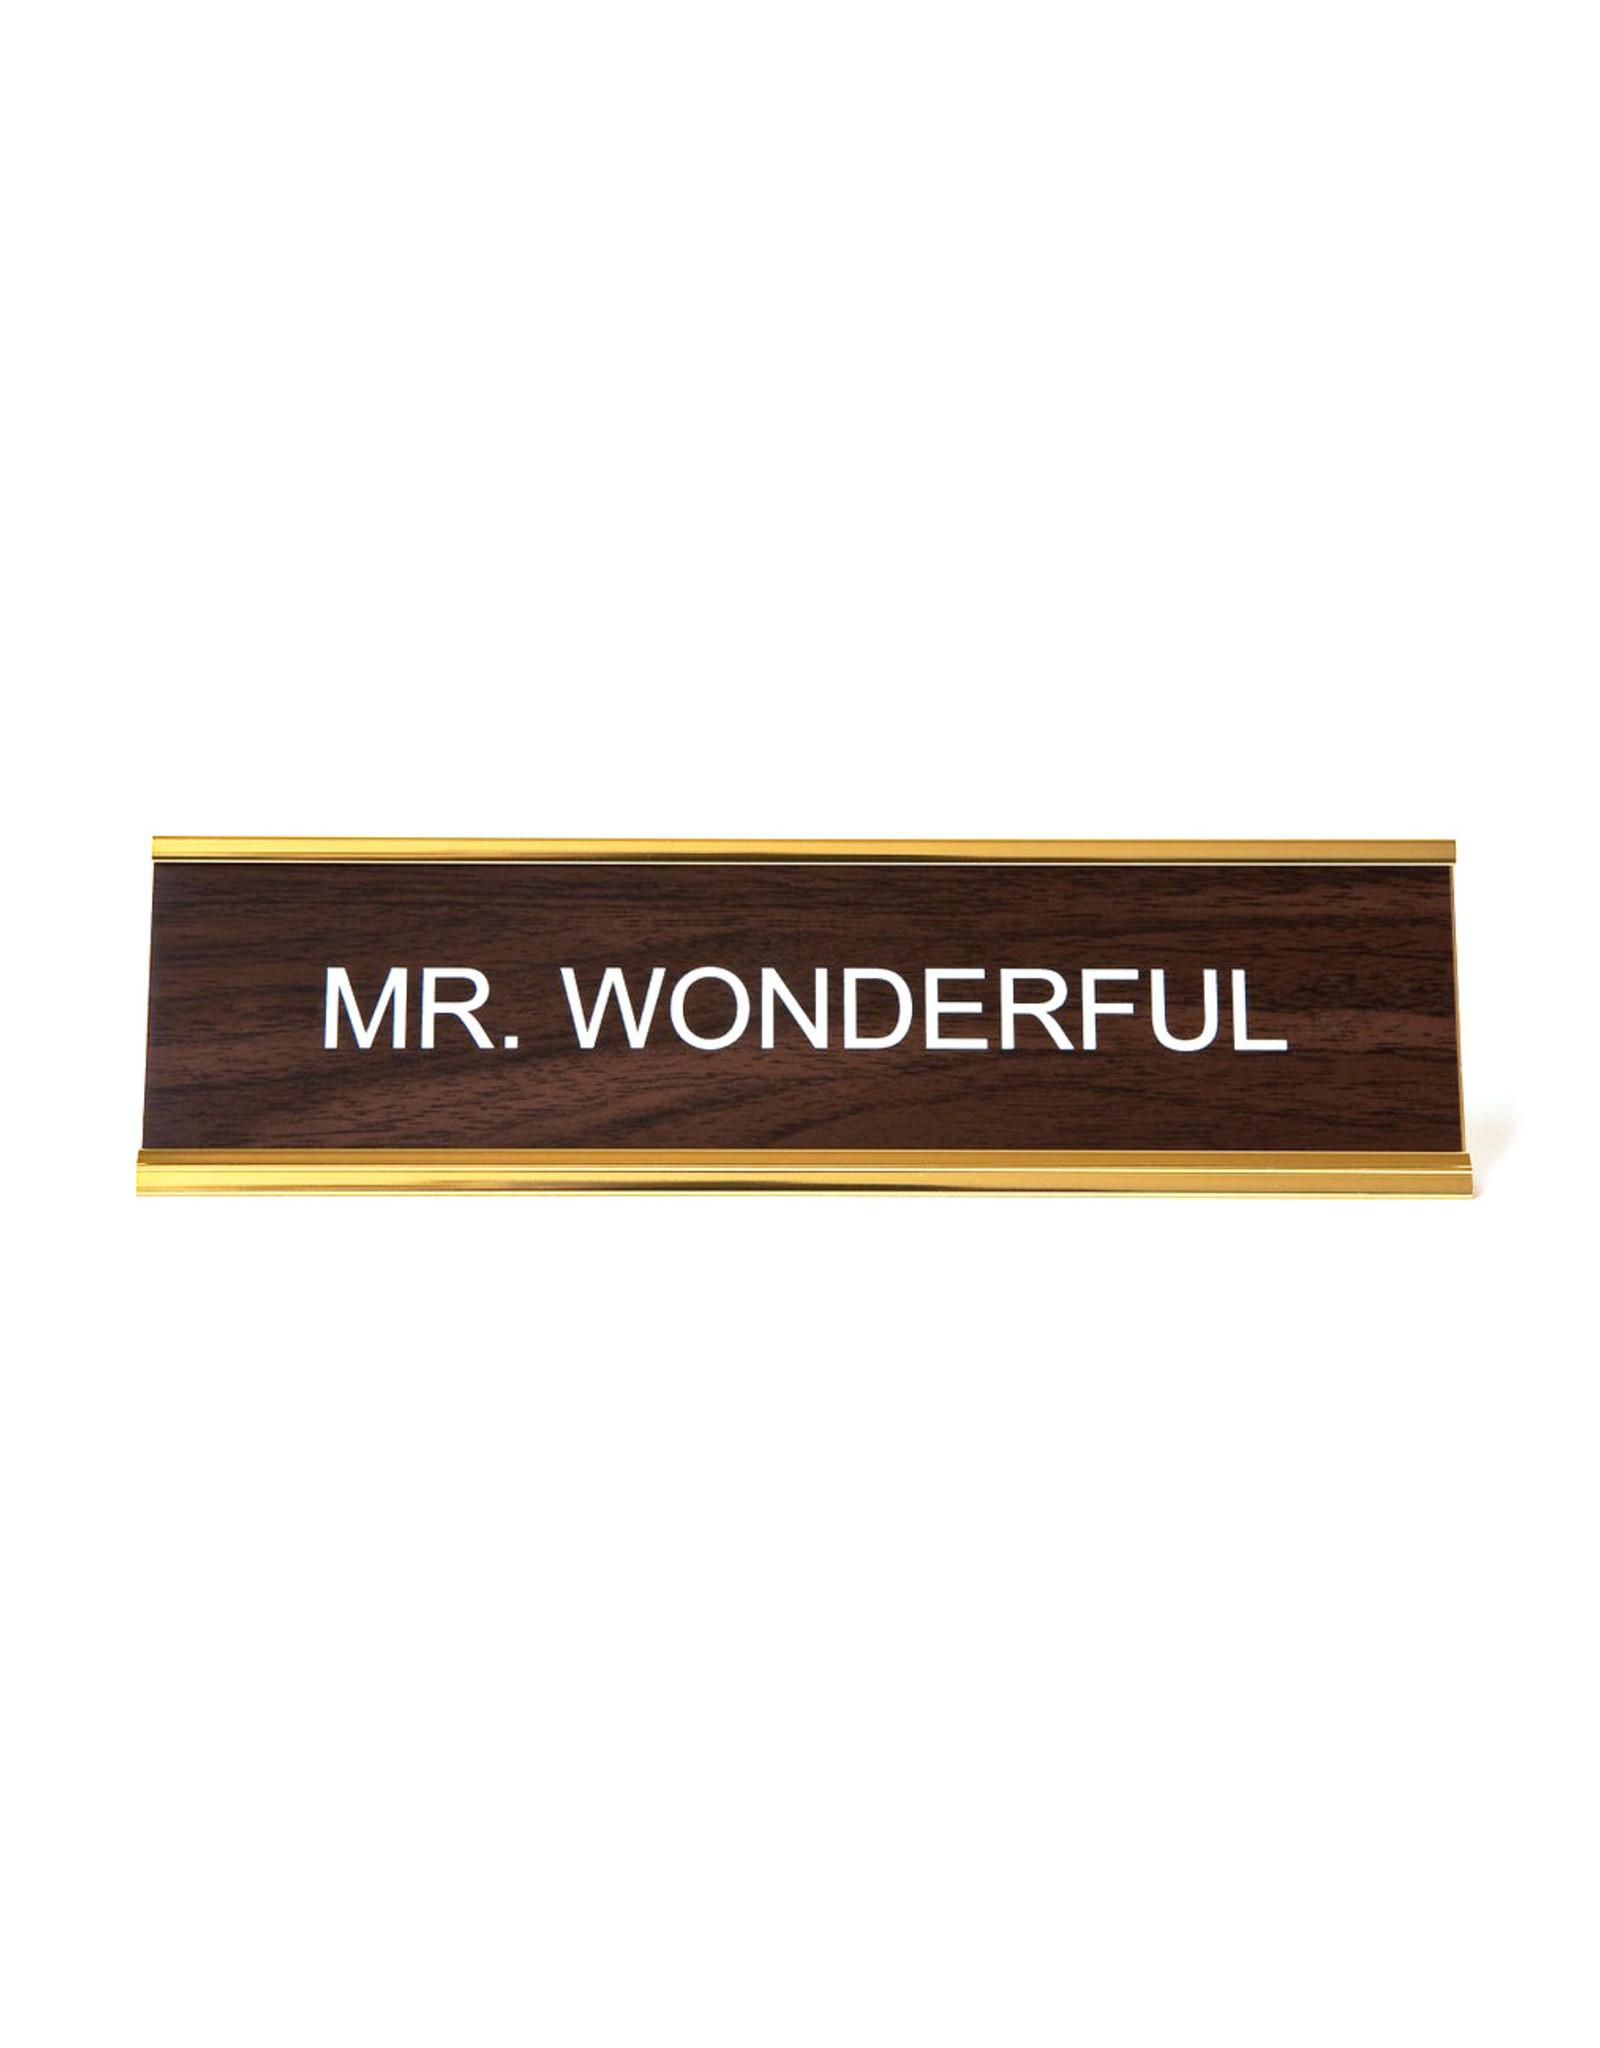 Mr. Wonderful Office Sign